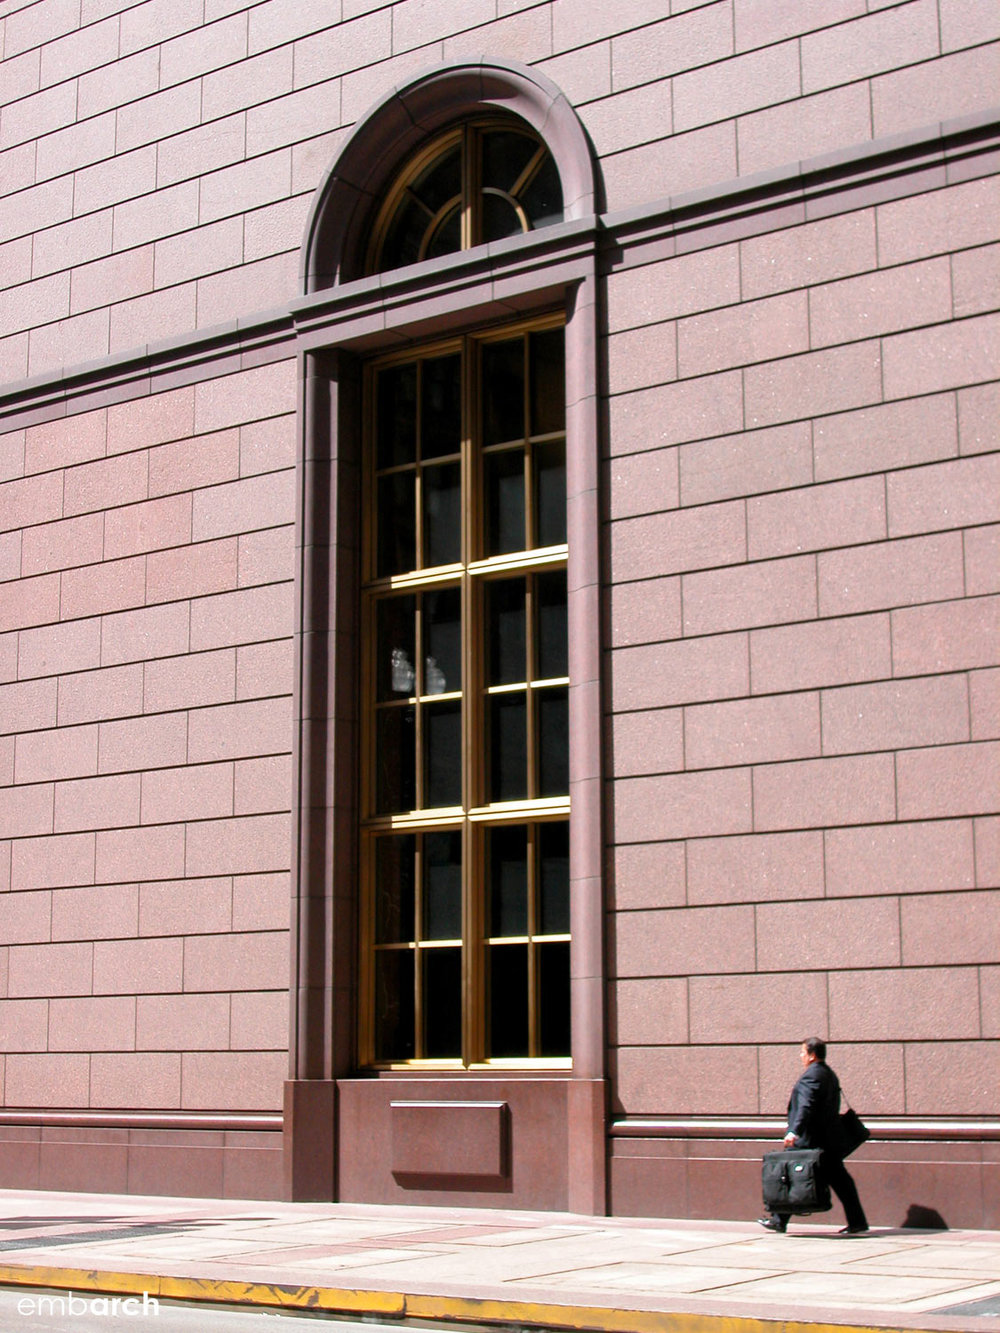 190 S Lasalle - exterior